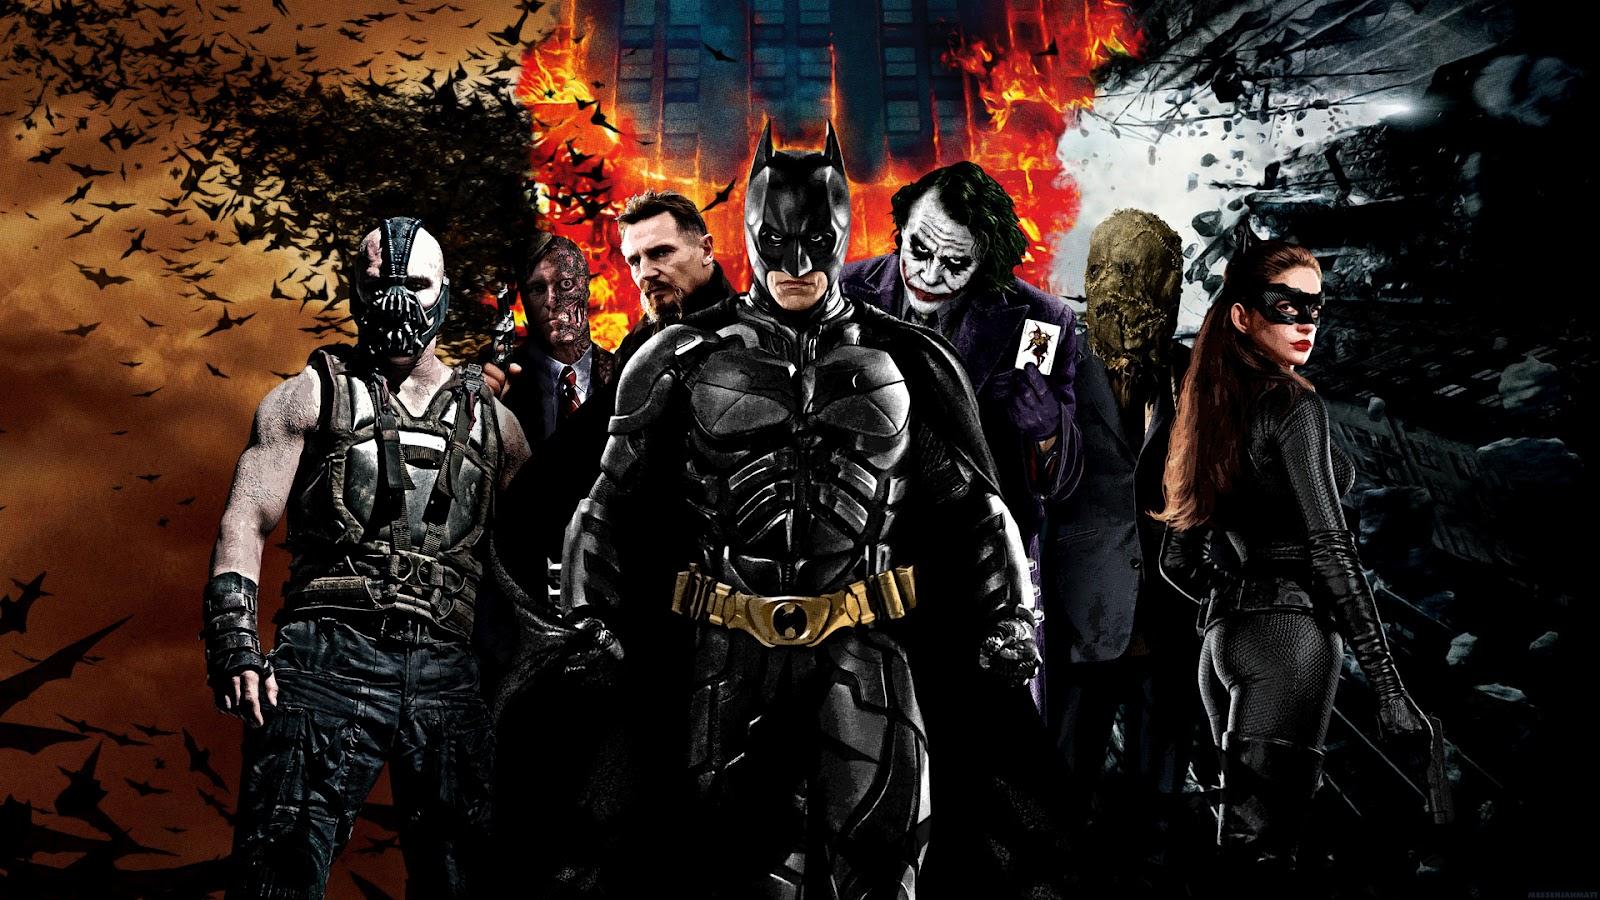 http://1.bp.blogspot.com/-wVGVR6Fvny8/UFh2wZcQFCI/AAAAAAAAnFc/CdZu-svzIPY/s1600/Batman-Dark-Knight-Rises_Fondos-de-Pantalla-HD-de-Peliculas.jpg